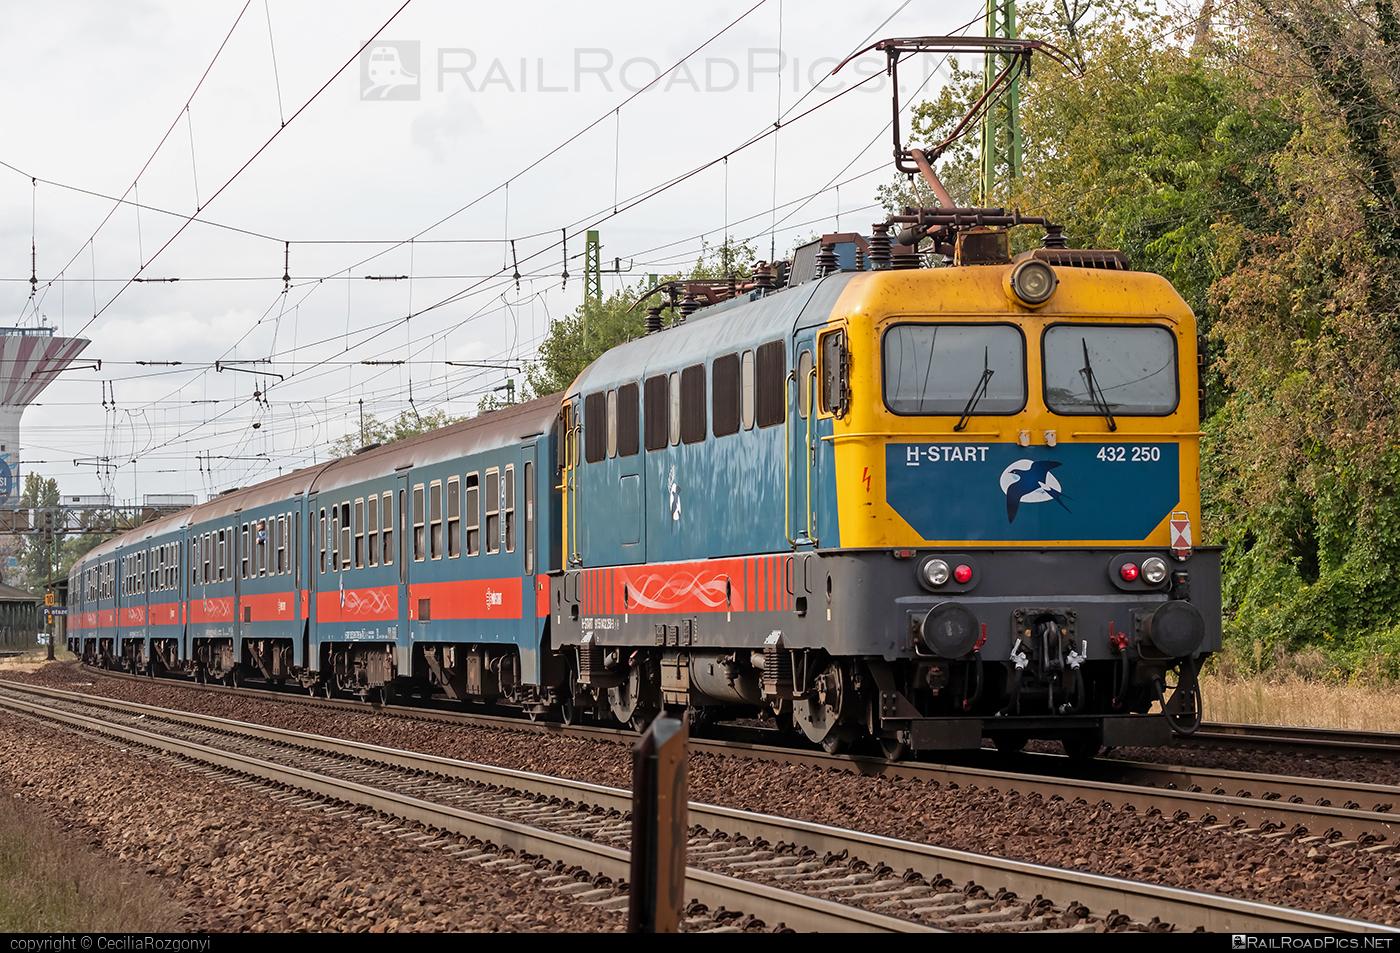 Ganz-MÁVAG VM14-19 - 432 250 operated by MÁV-START ZRt. #ganz43 #ganz432 #ganzmavag #ganzmavag43 #ganzmavag432 #ganzmavagvm1419 #locomotive432 #mavstart #mavstartzrt #v43locomotive